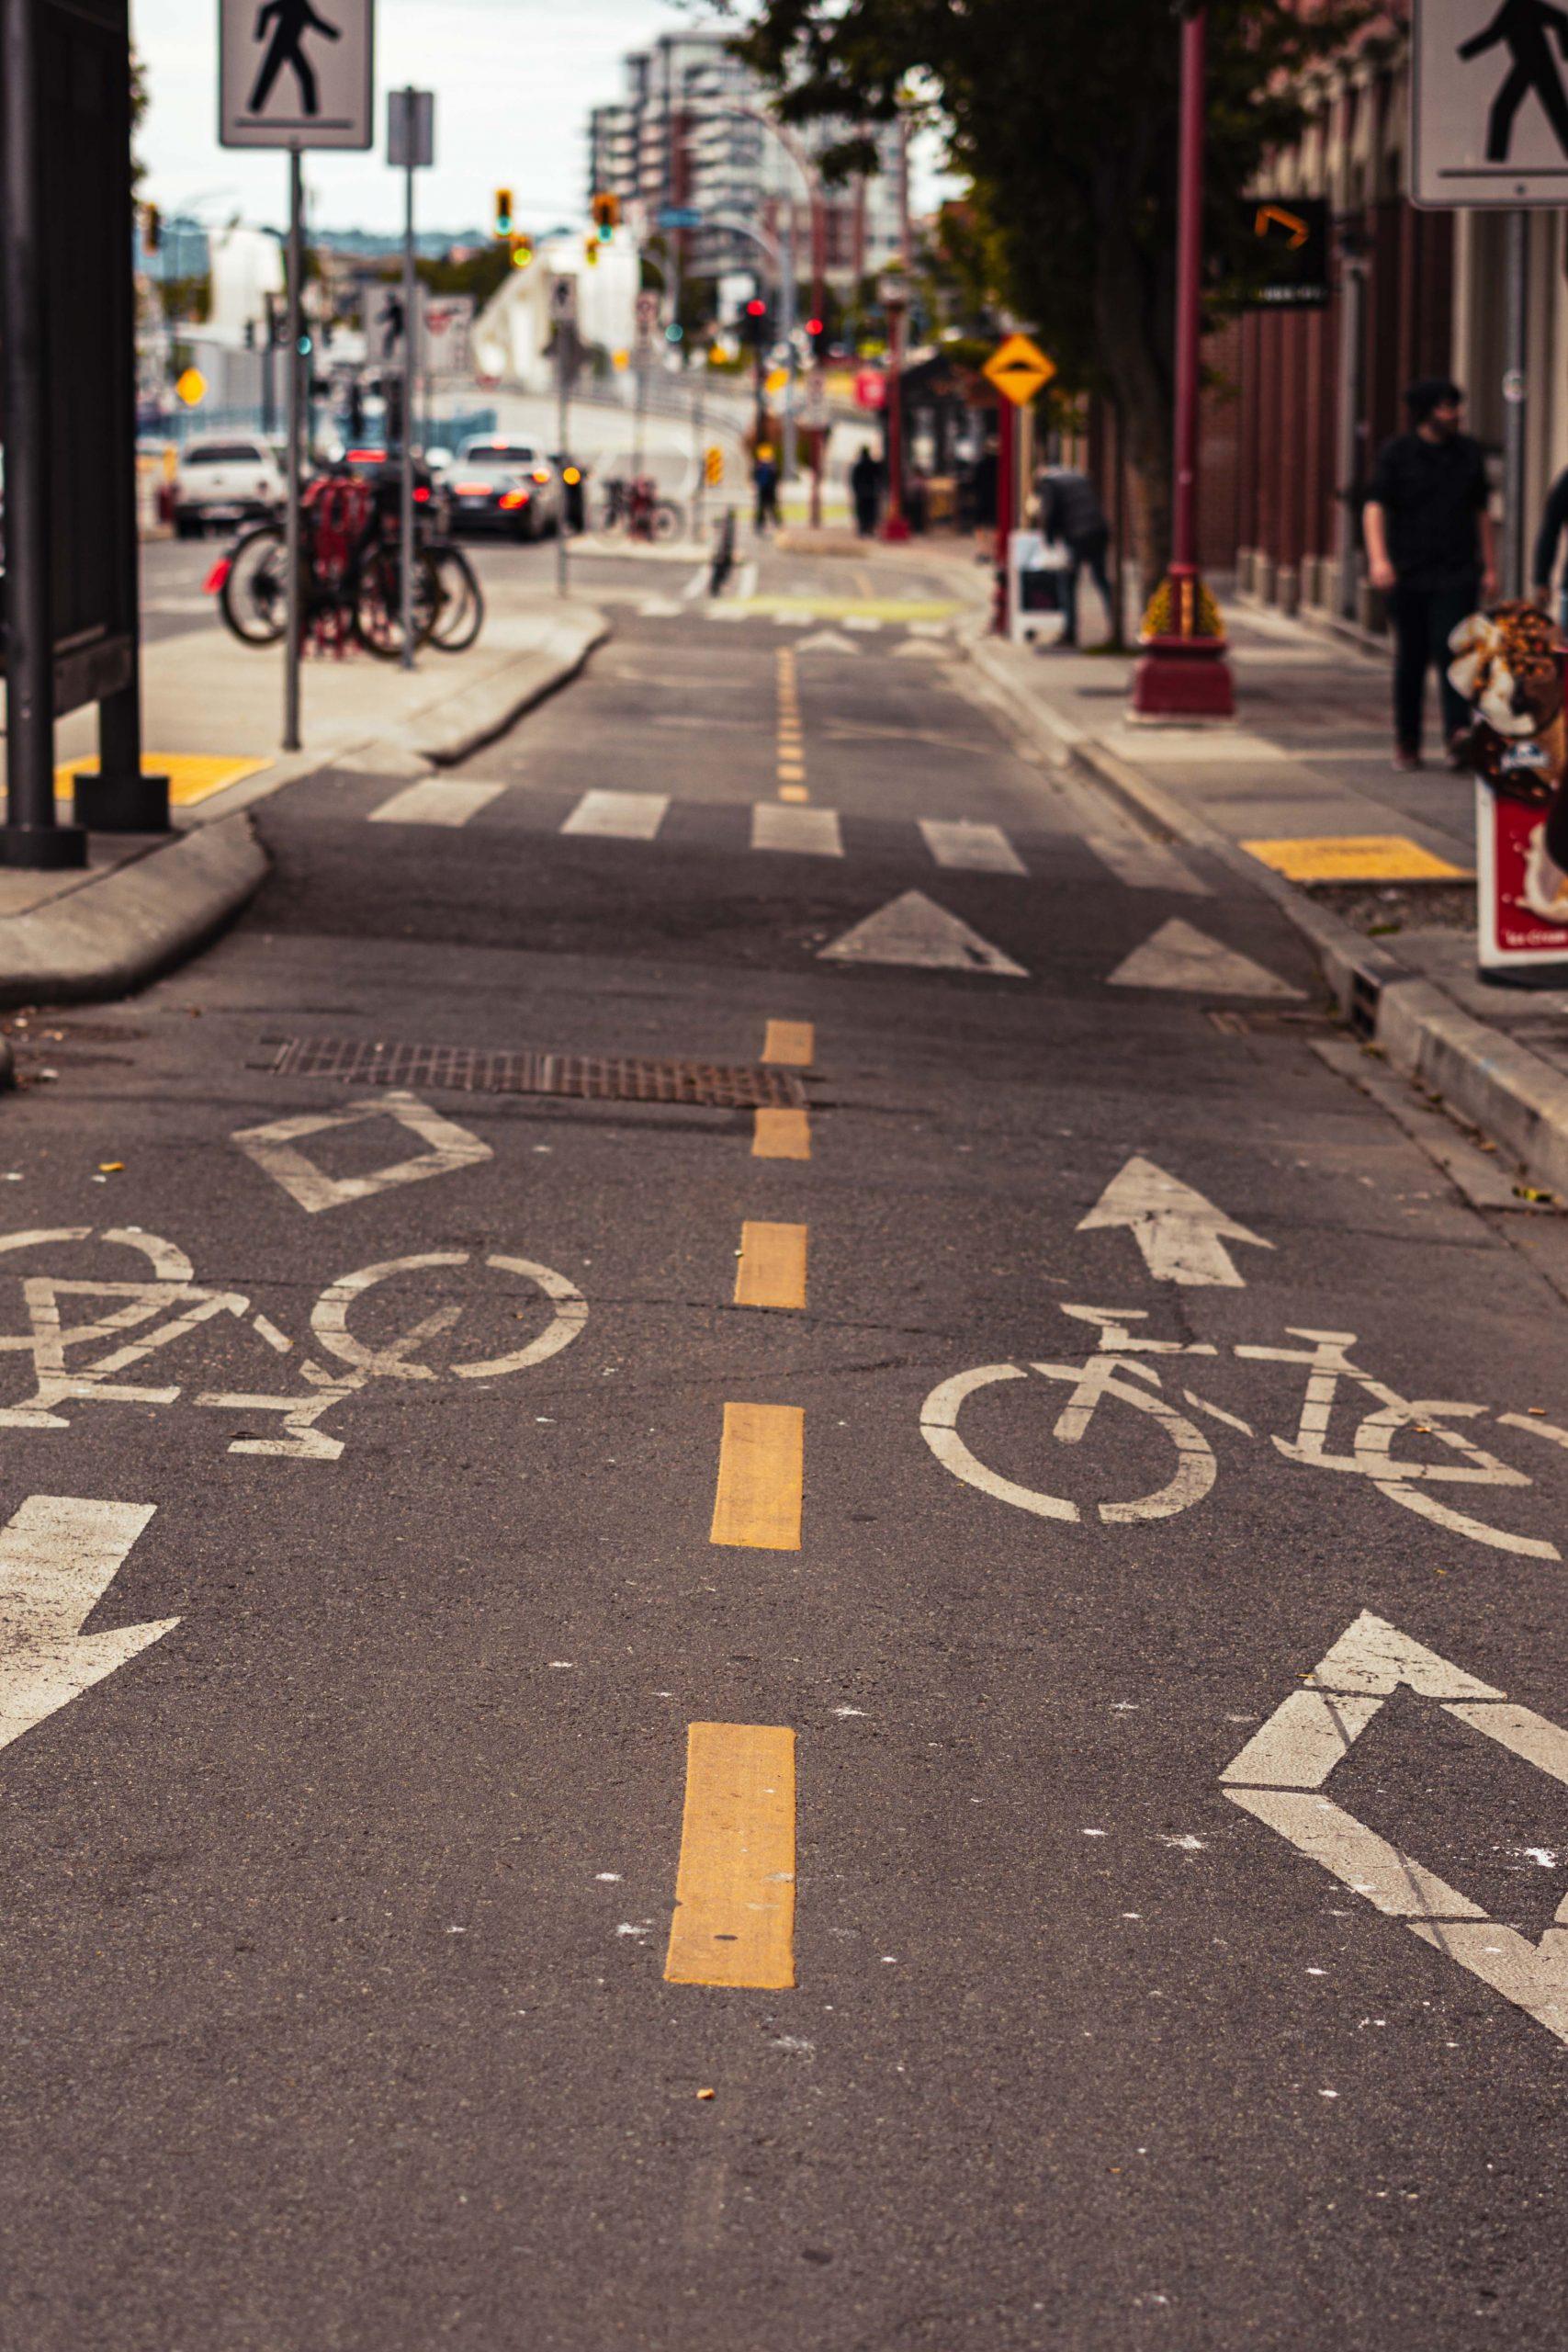 Carriles bici: una apuesta necesaria